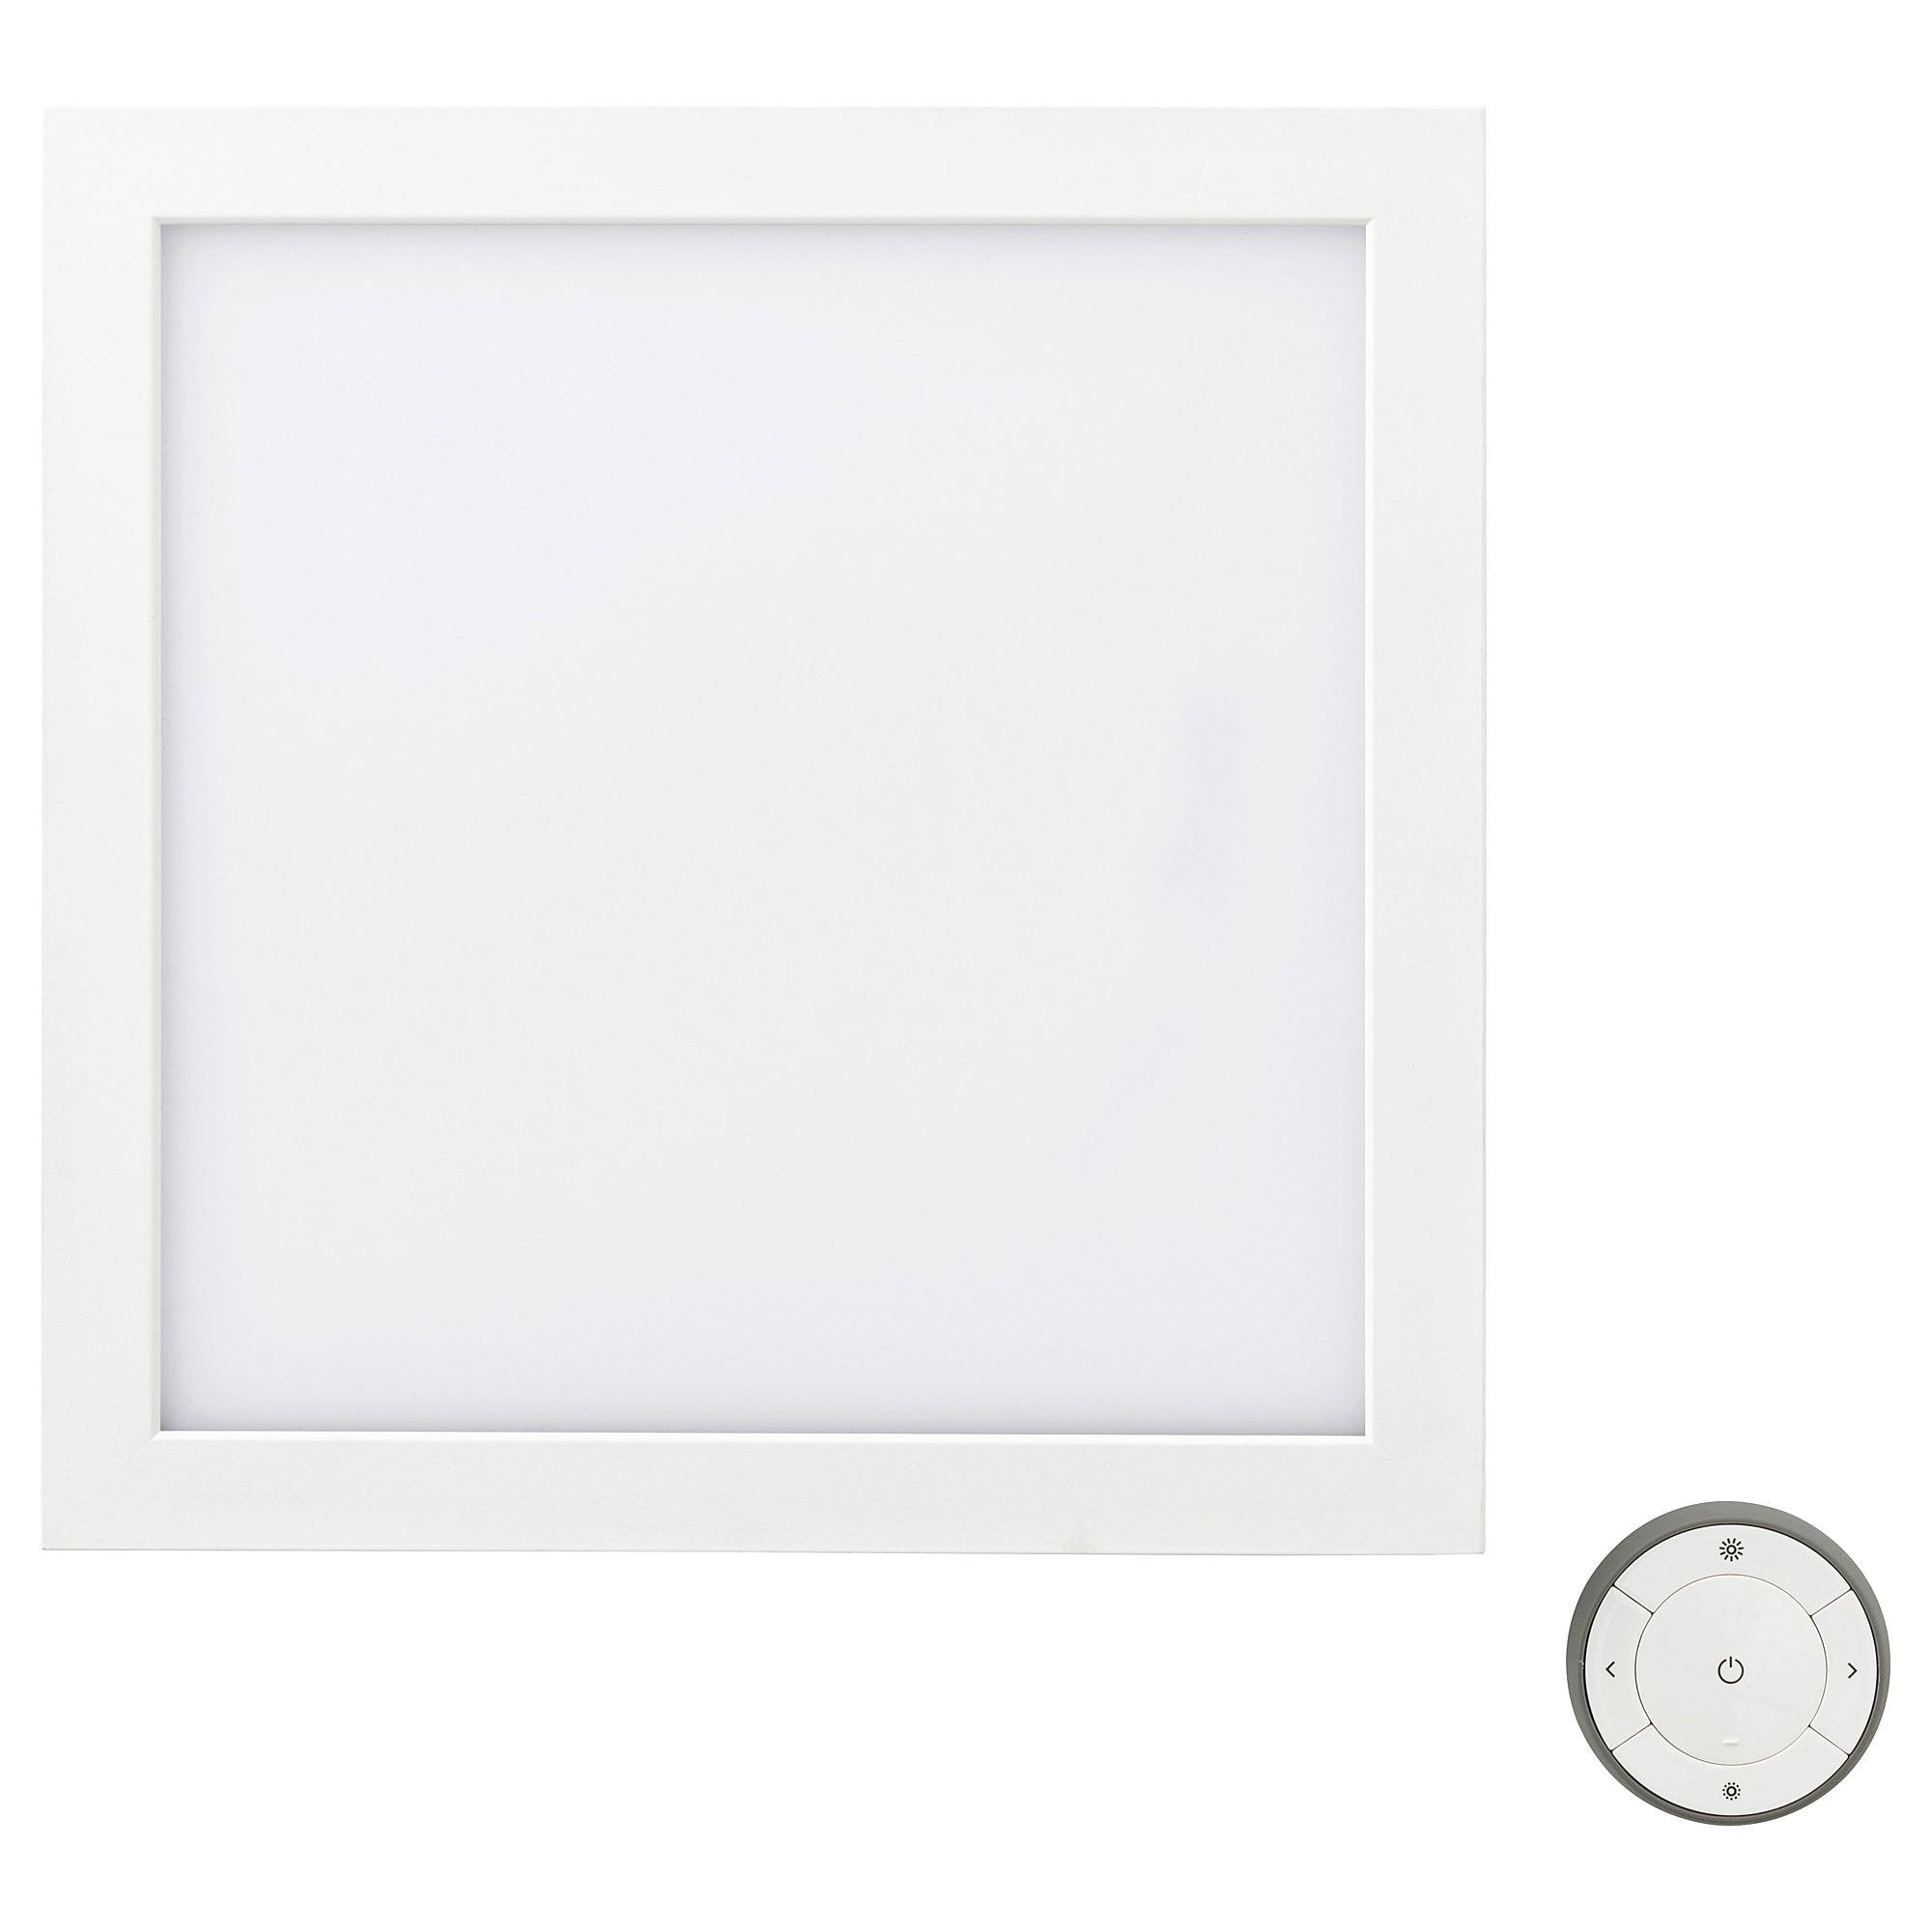 Floalt Led Light Panel W Wireless Control Dimmable White Spectrum